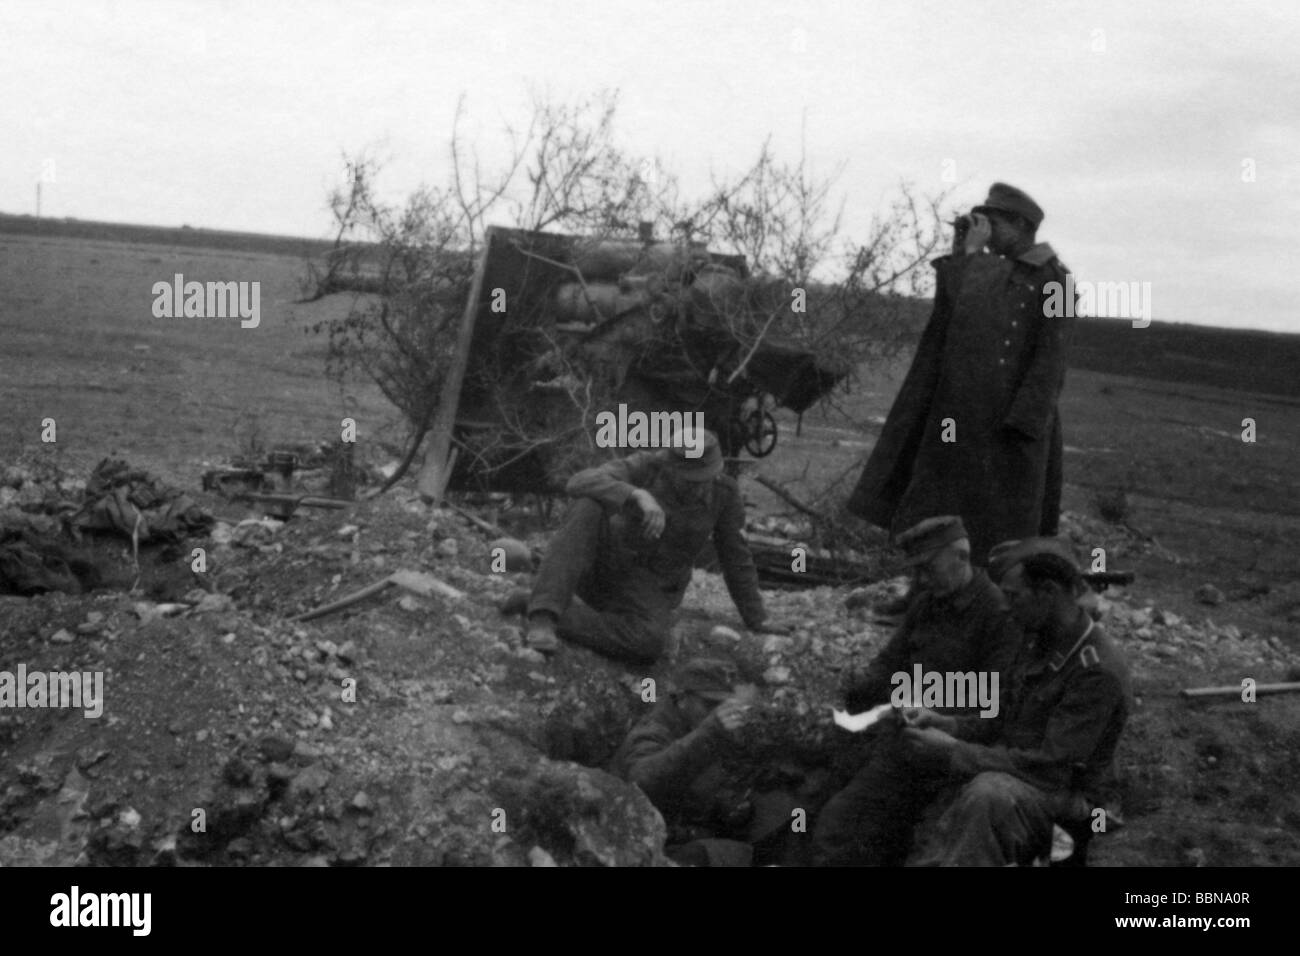 events, Second World War / WWII, Russia 1944 / 1945, Crimea, Sevastopol, German 88 mm anti-aircraft guns Flak 36/37 - Stock Image